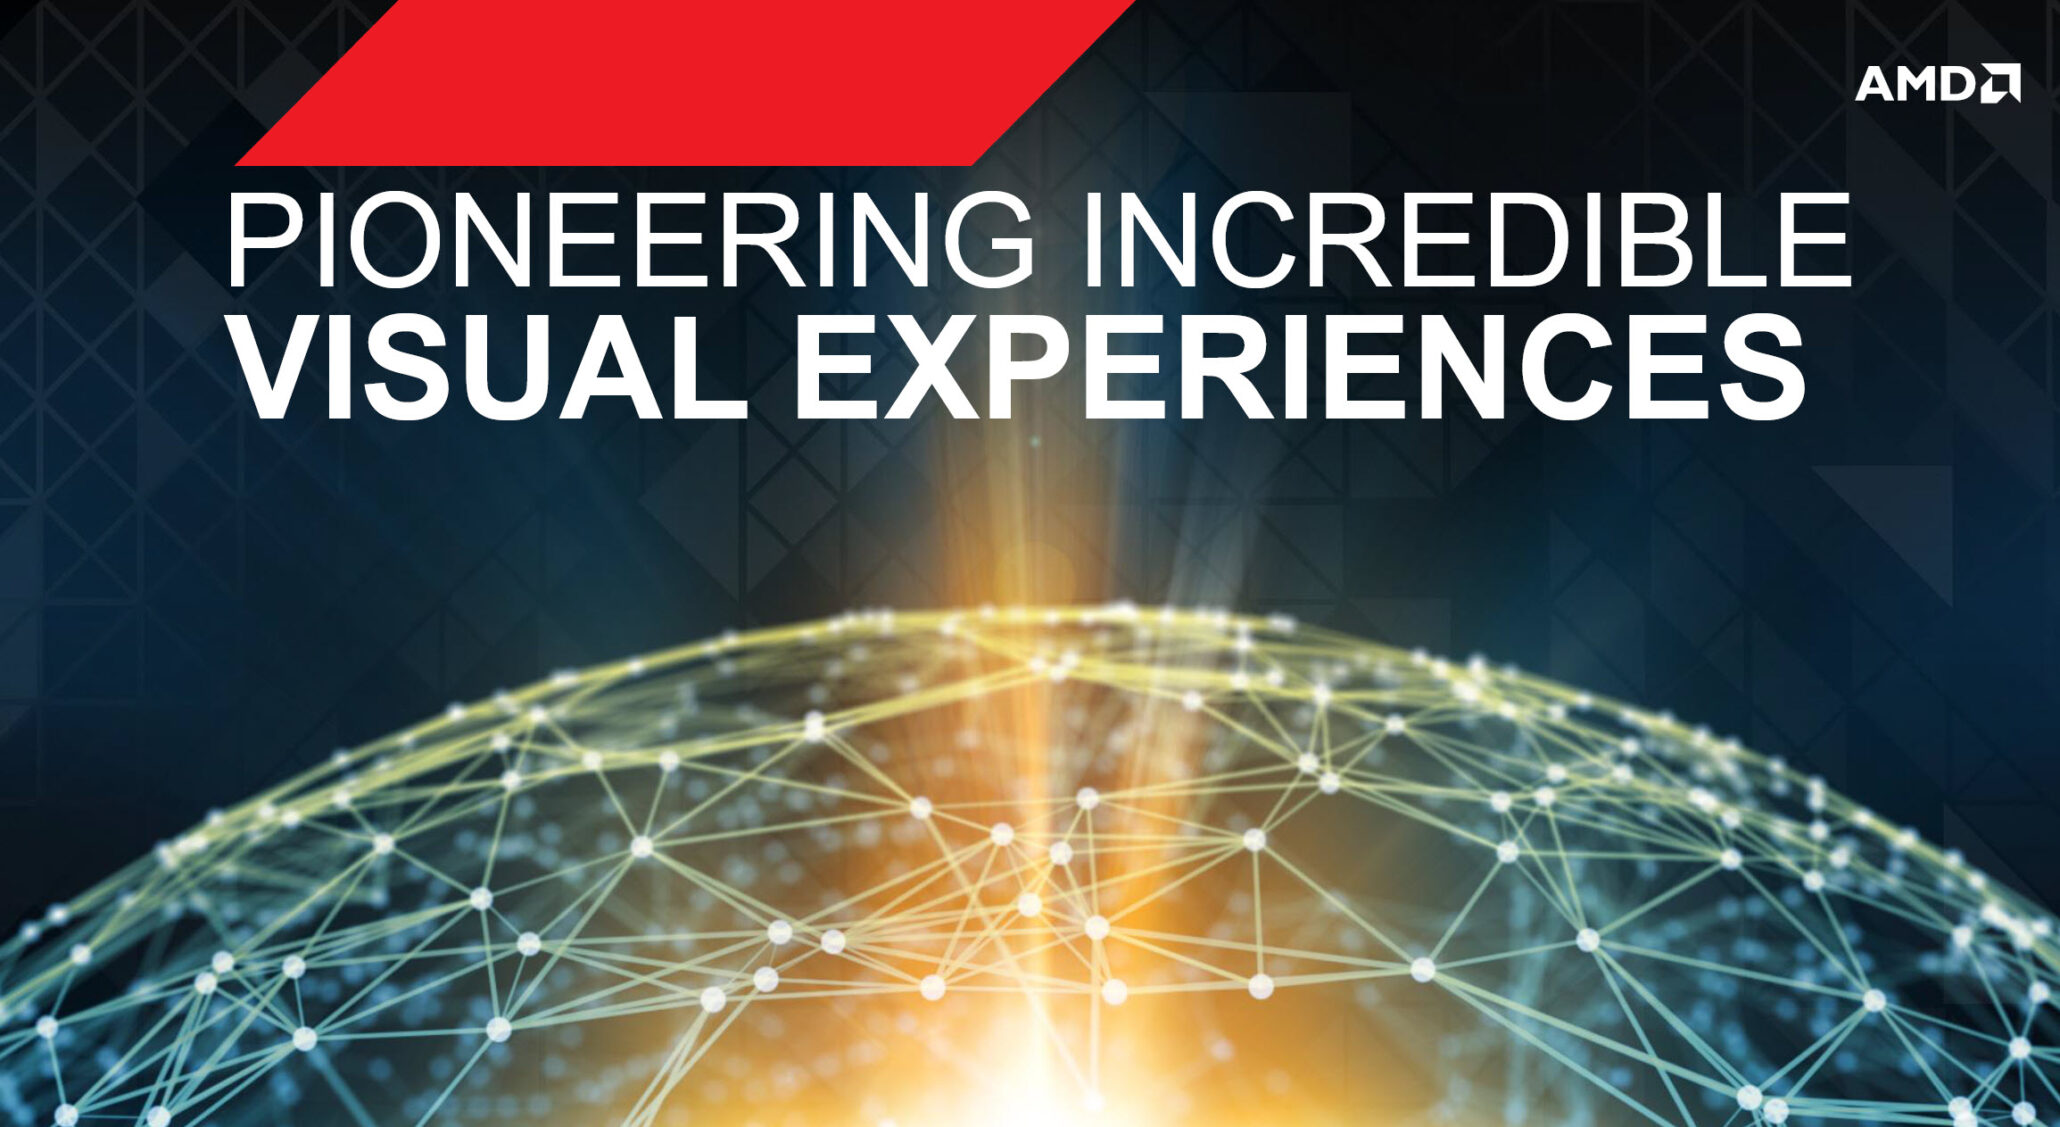 amd-visual-experiences